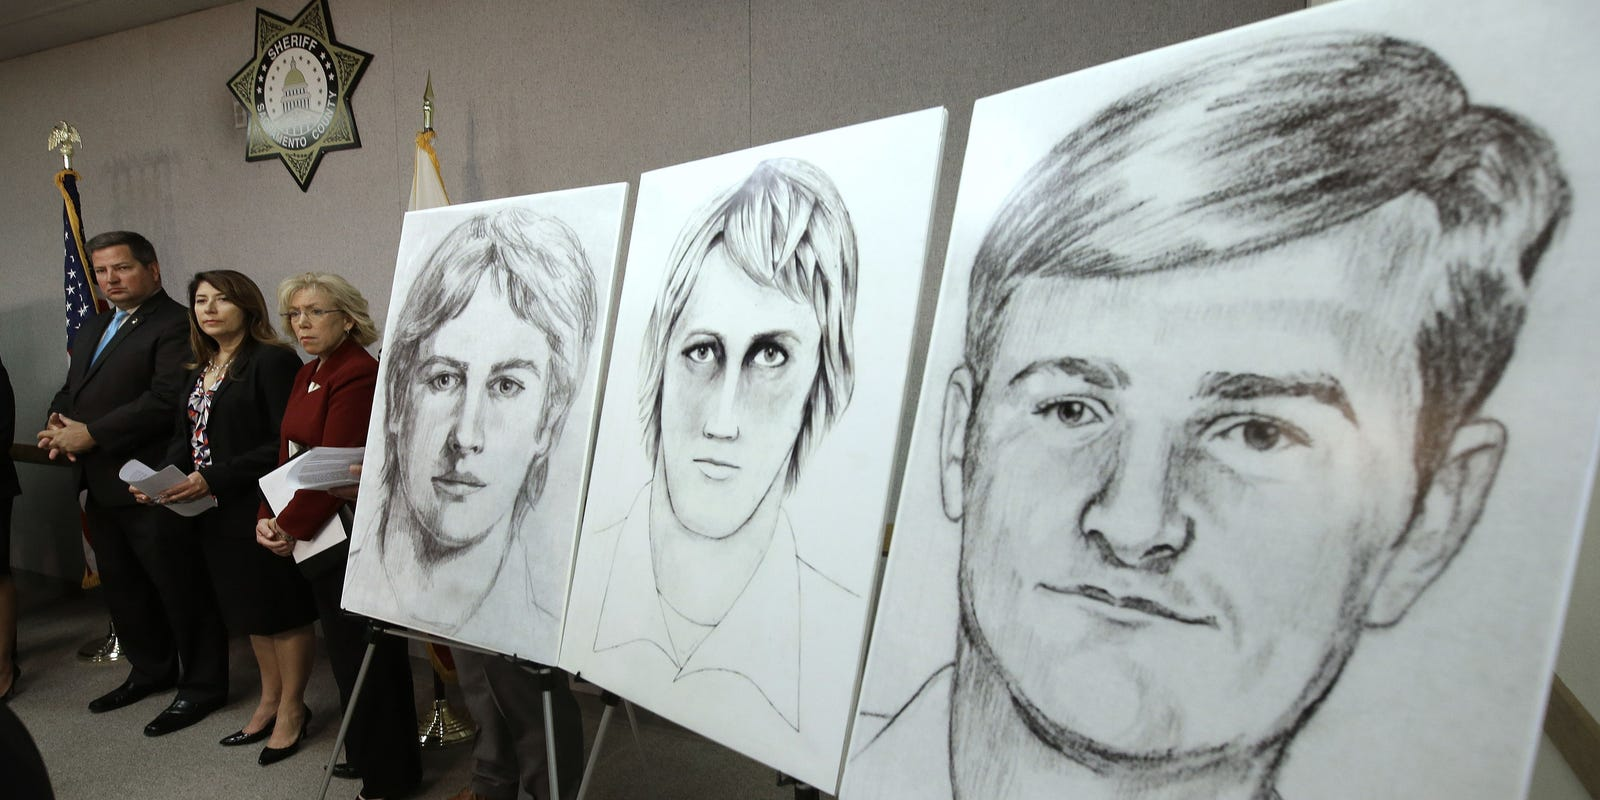 Golden State Killer: Joseph James DeAngelo arrested as suspect